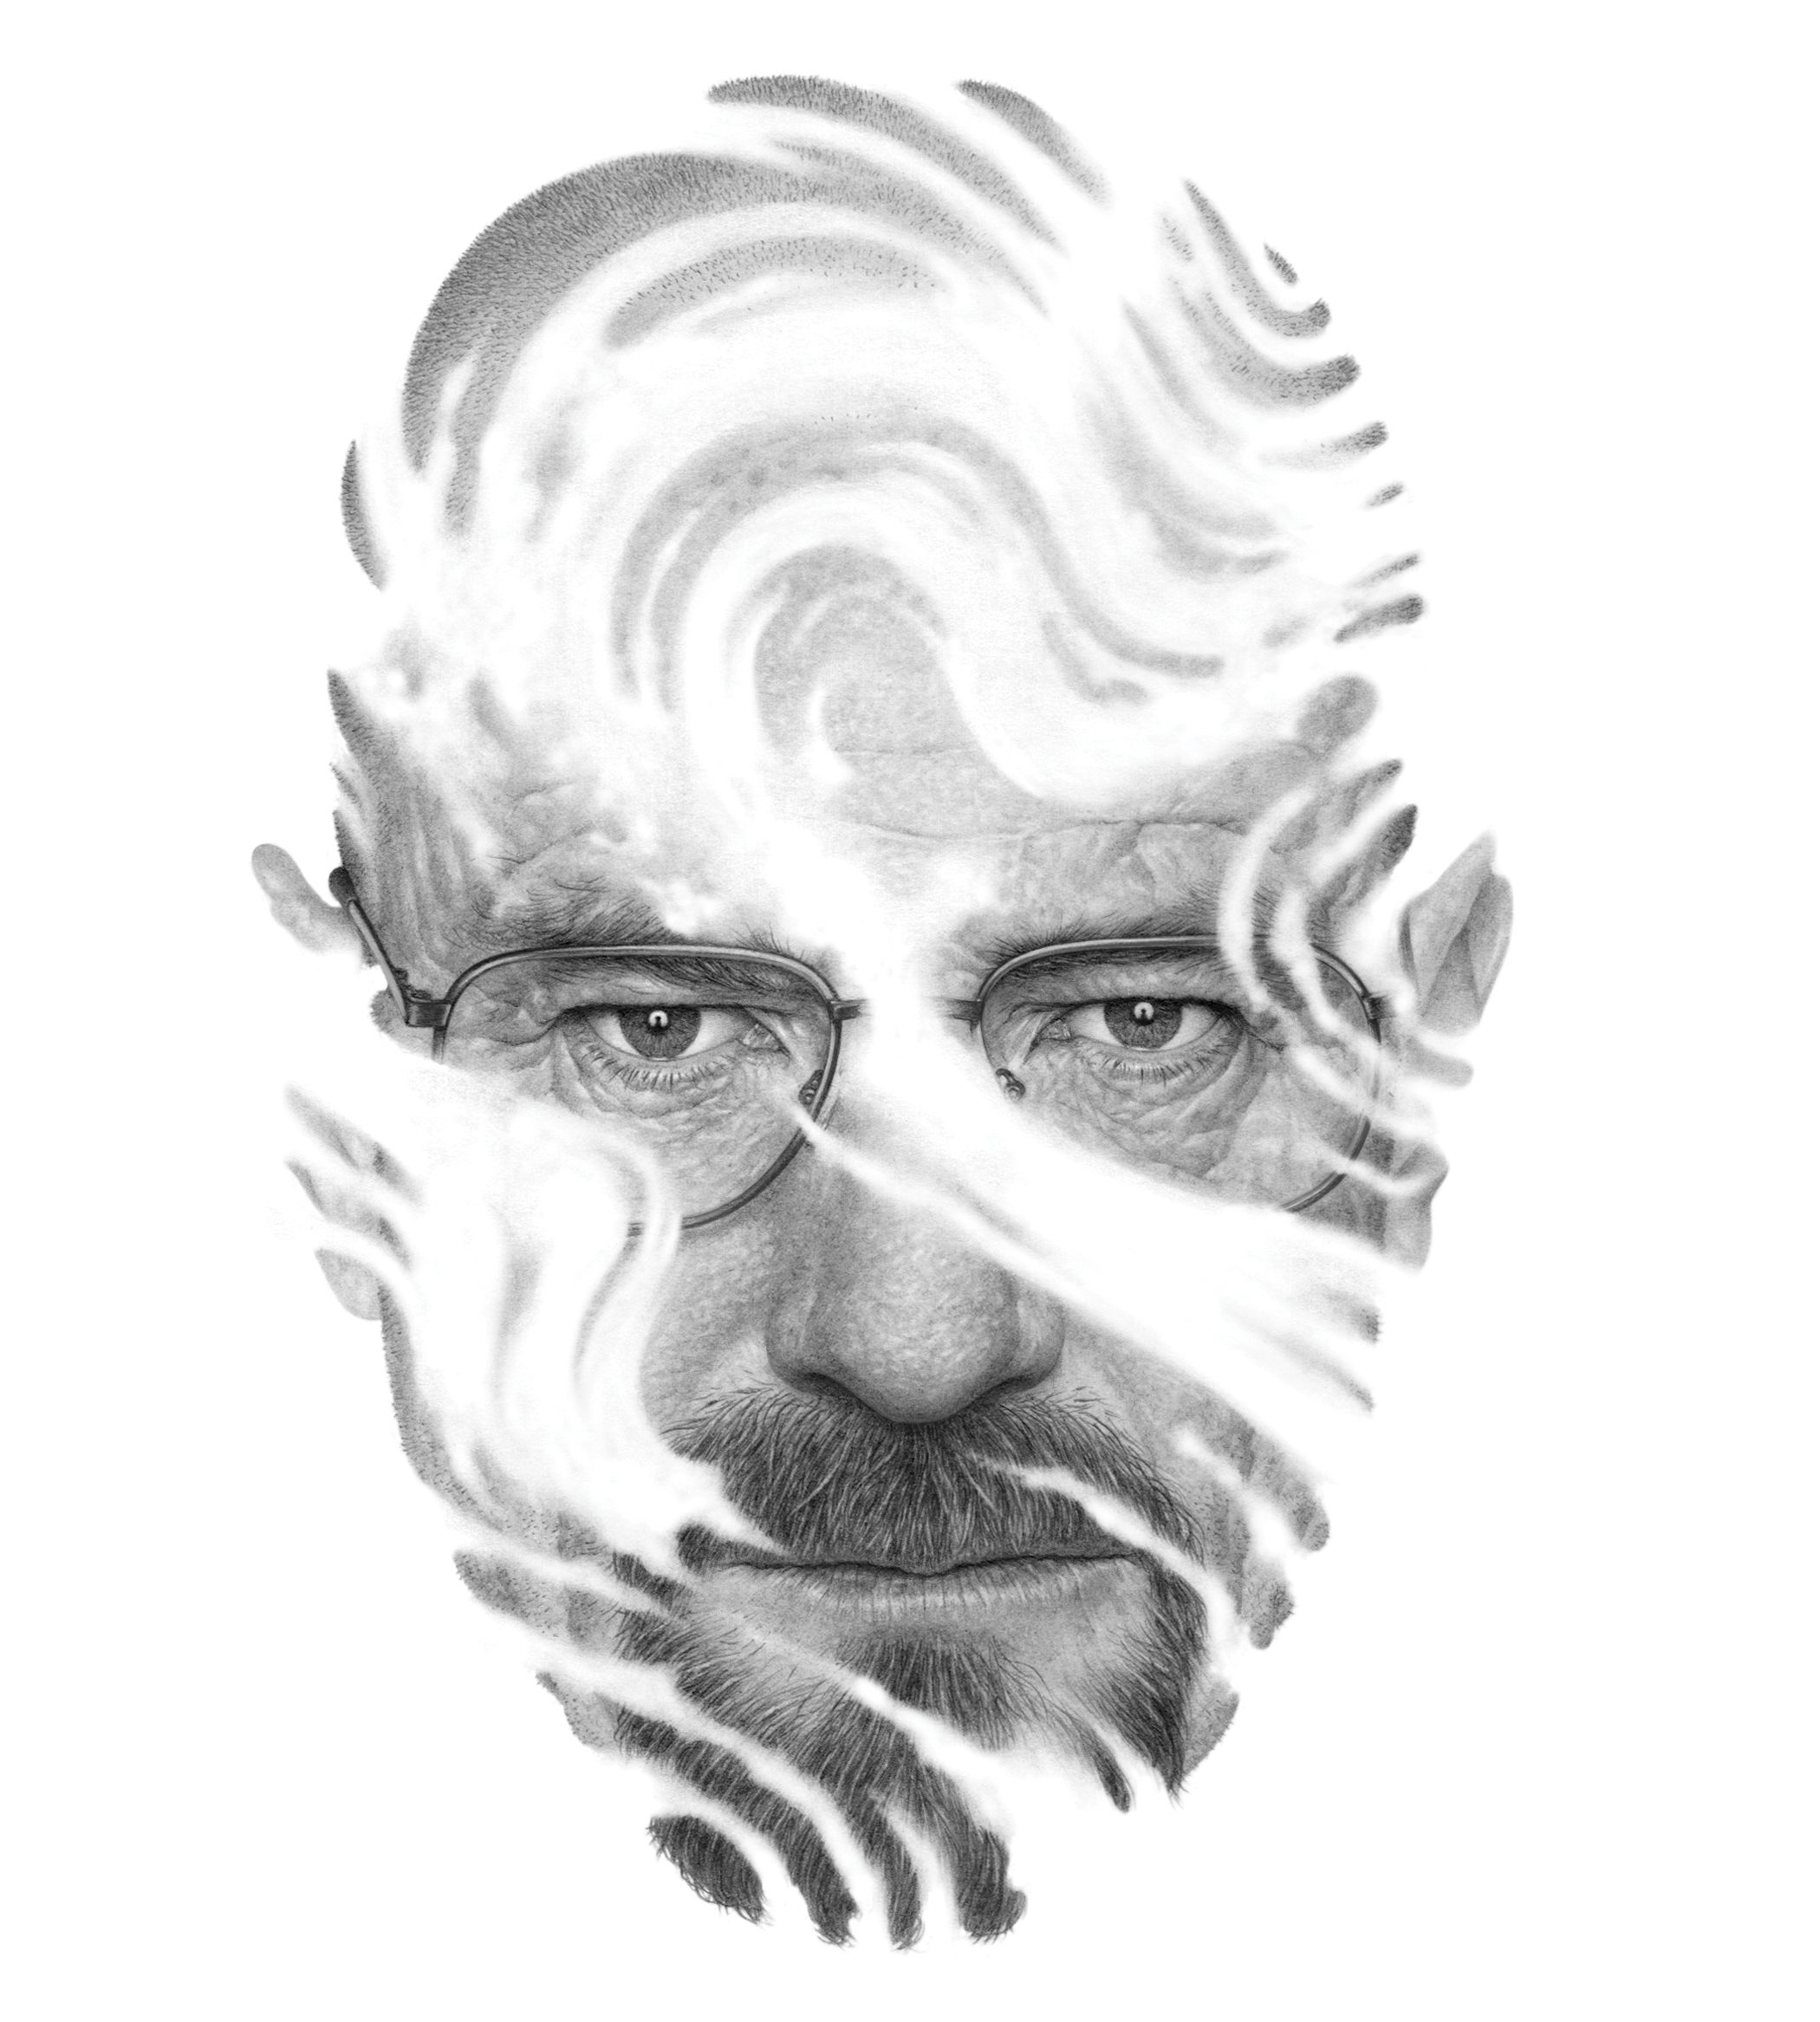 Heisenberg Lives: What Happens When Walter White Leaves Us? by David Thomson http://on.tnr.com/17HY0yP Illustration by Boris Pelcer